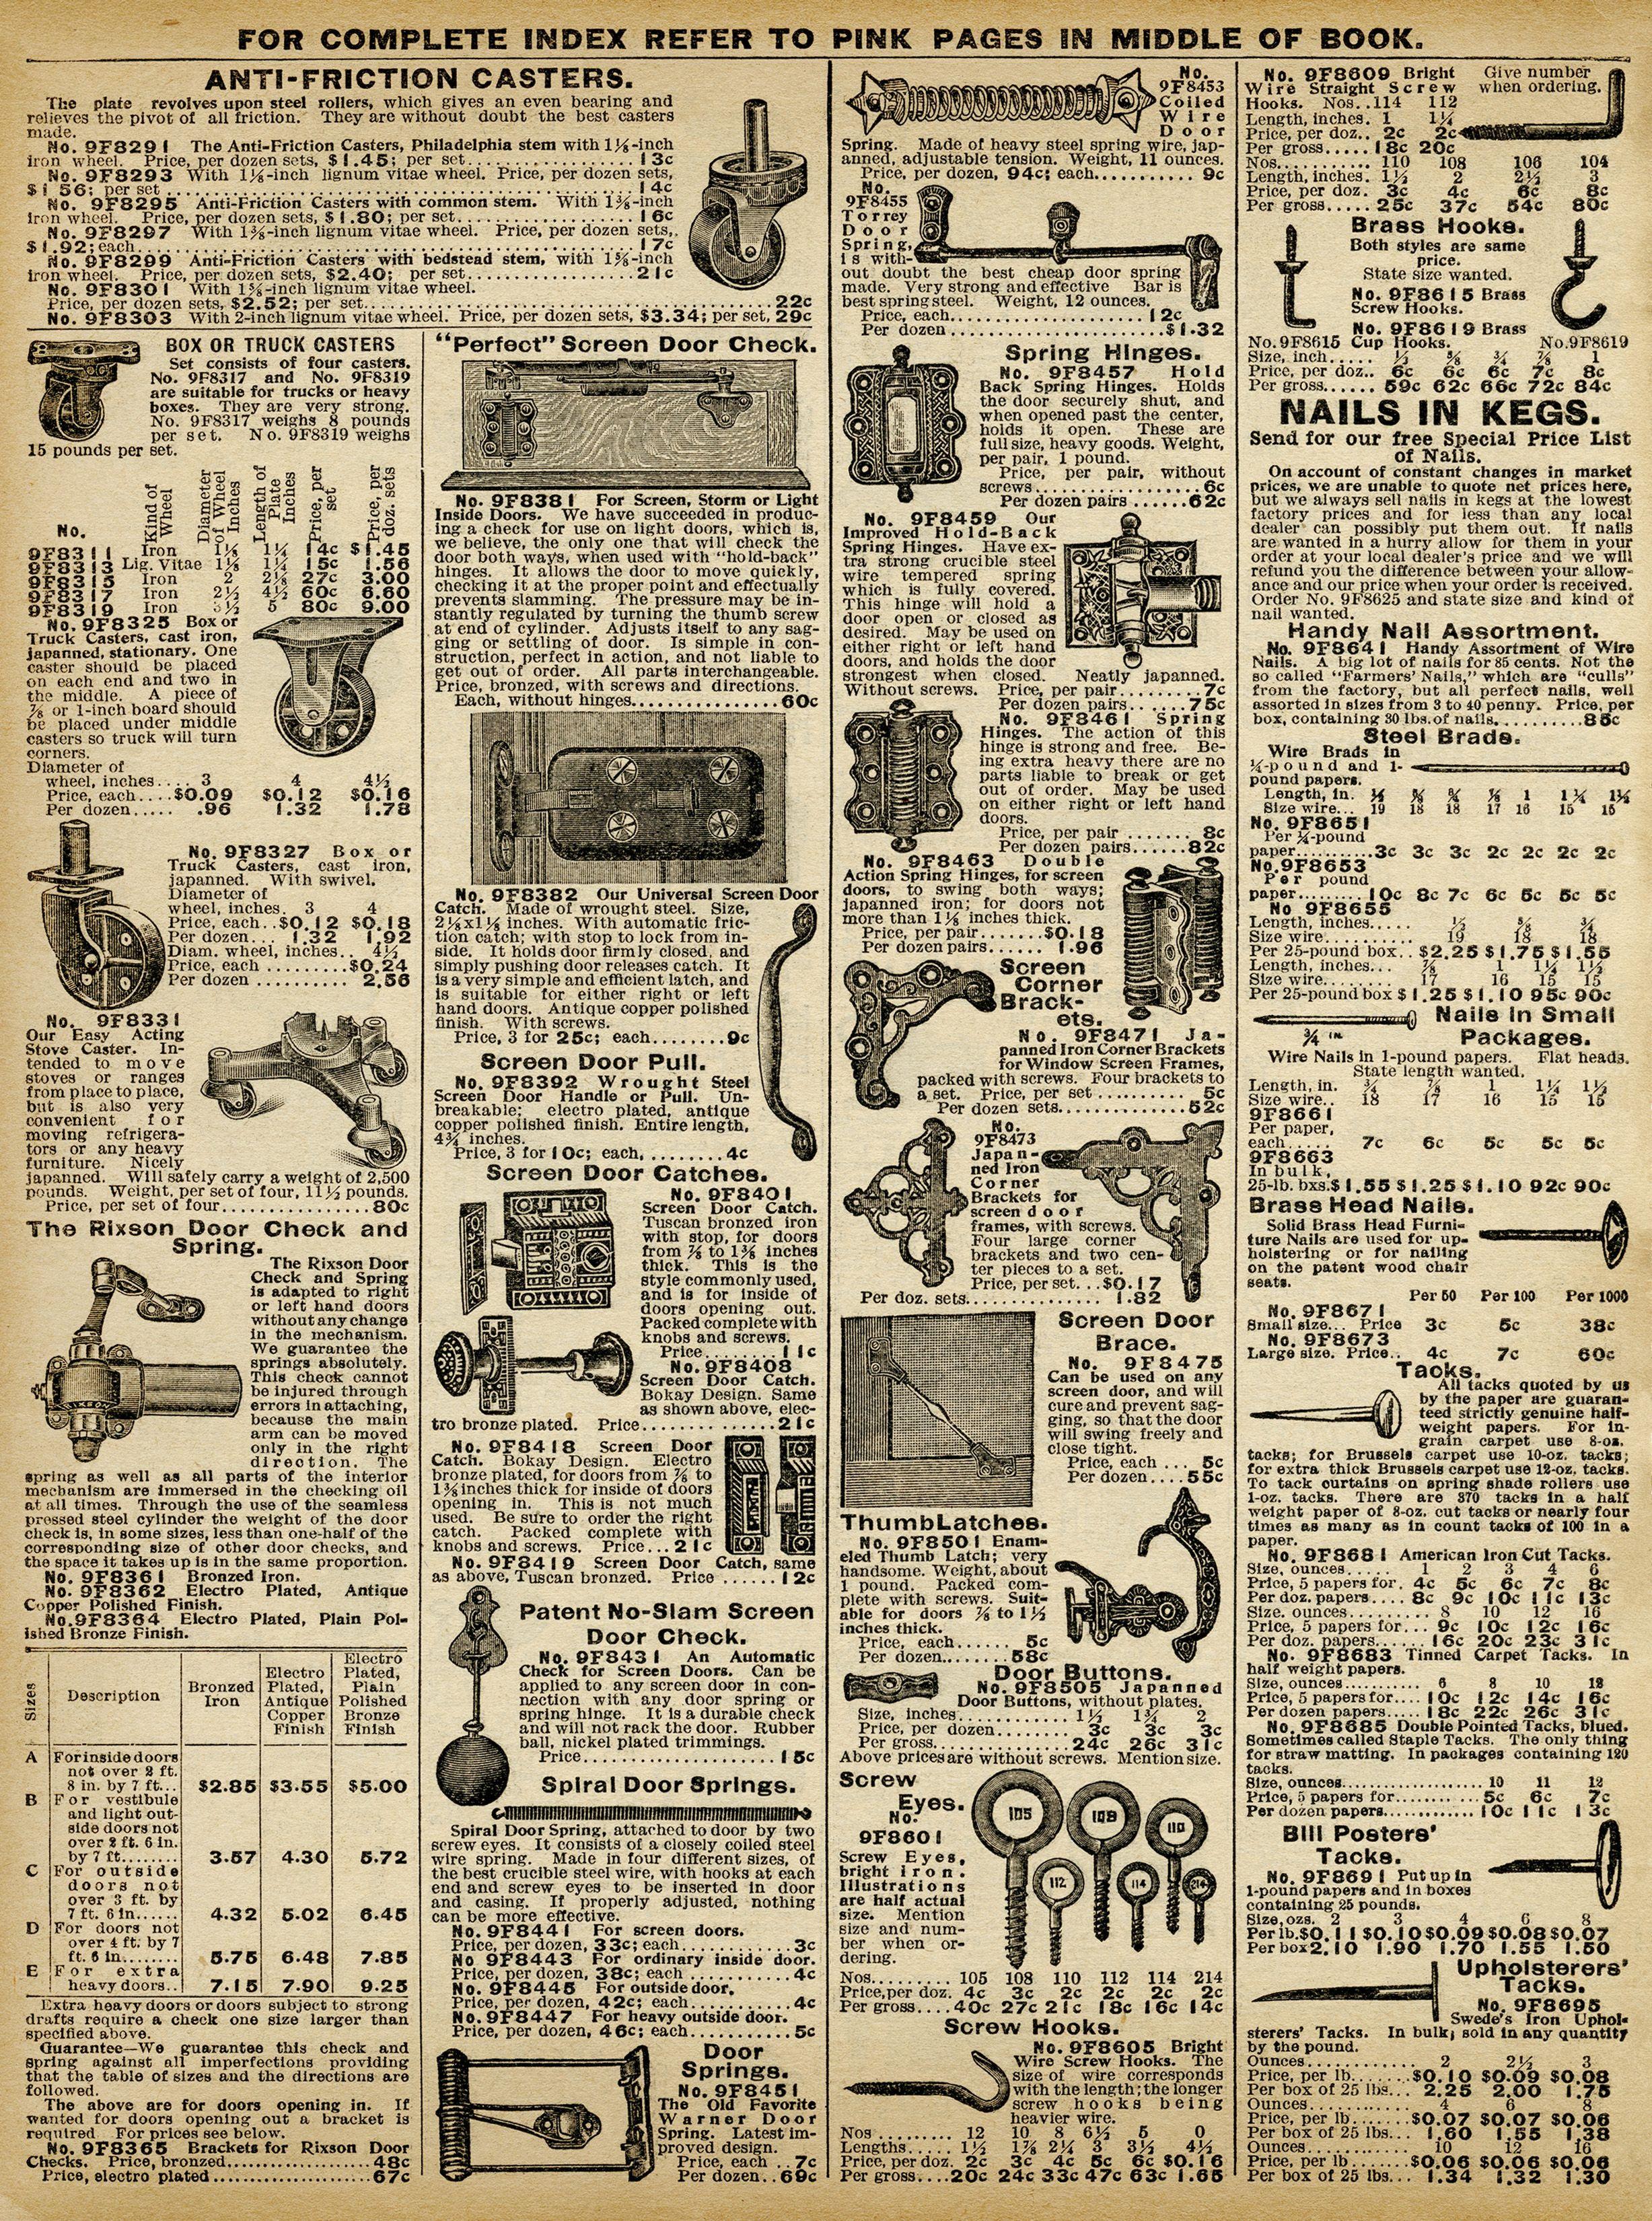 Free Vintage Hardware Catalog Book Pages Vintage Printables Background Digital Papers In 2020 Vintage Hardware Scrapbook Stickers Printable Vintage Newspaper